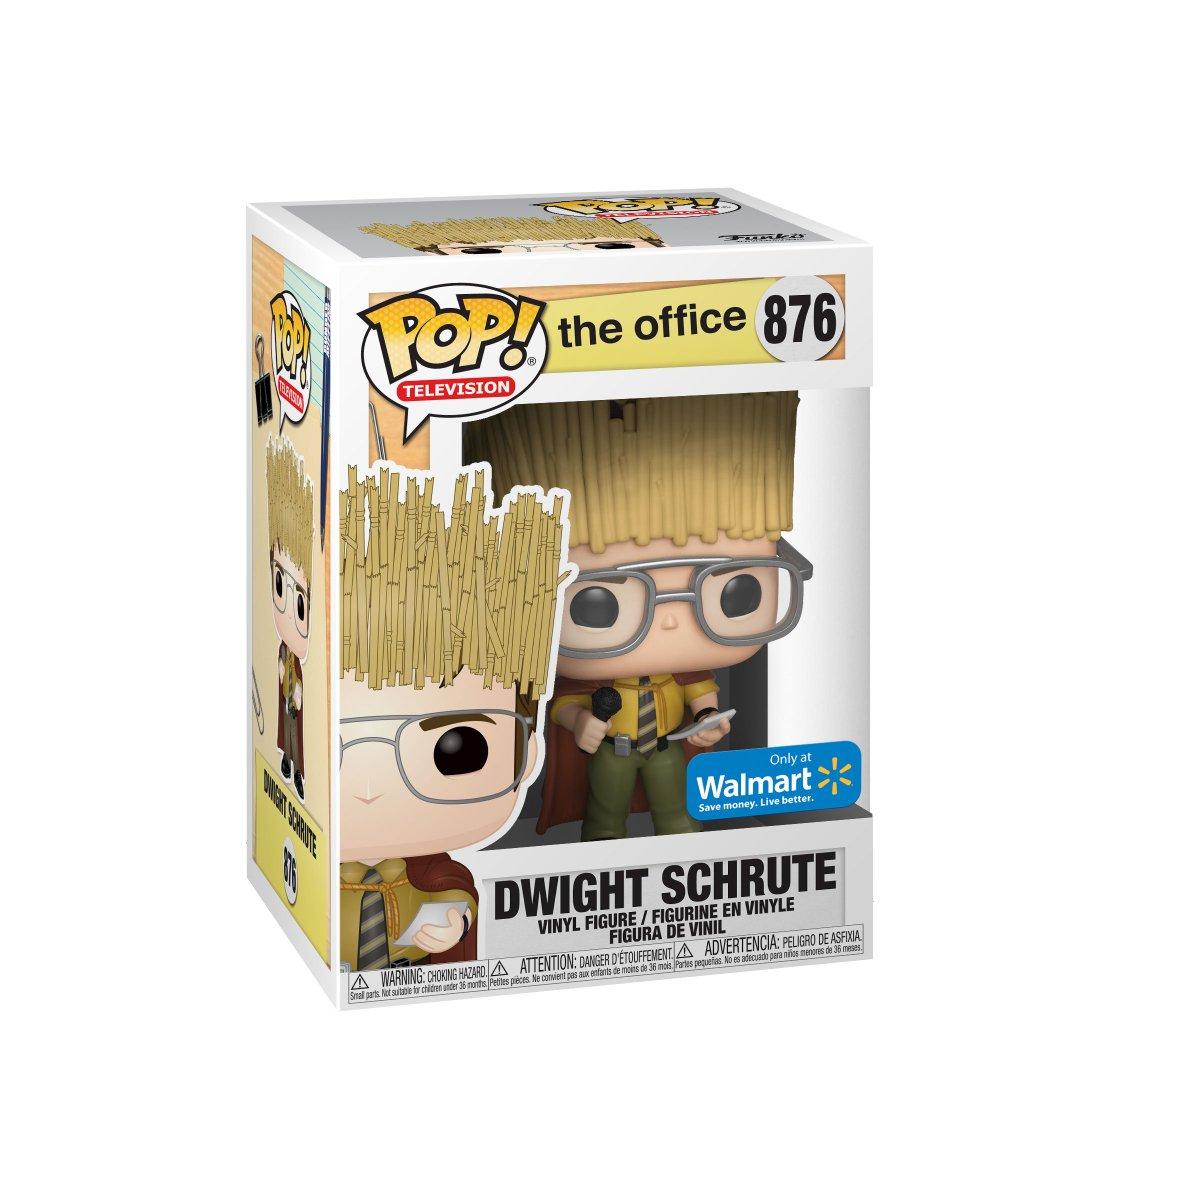 RT & follow @OriginalFunko for a chance to WIN a Walmart Exclusive Dwight Schrute Pop!  #TheOffice #Funko #FunkoPop #Pop #Giveaway